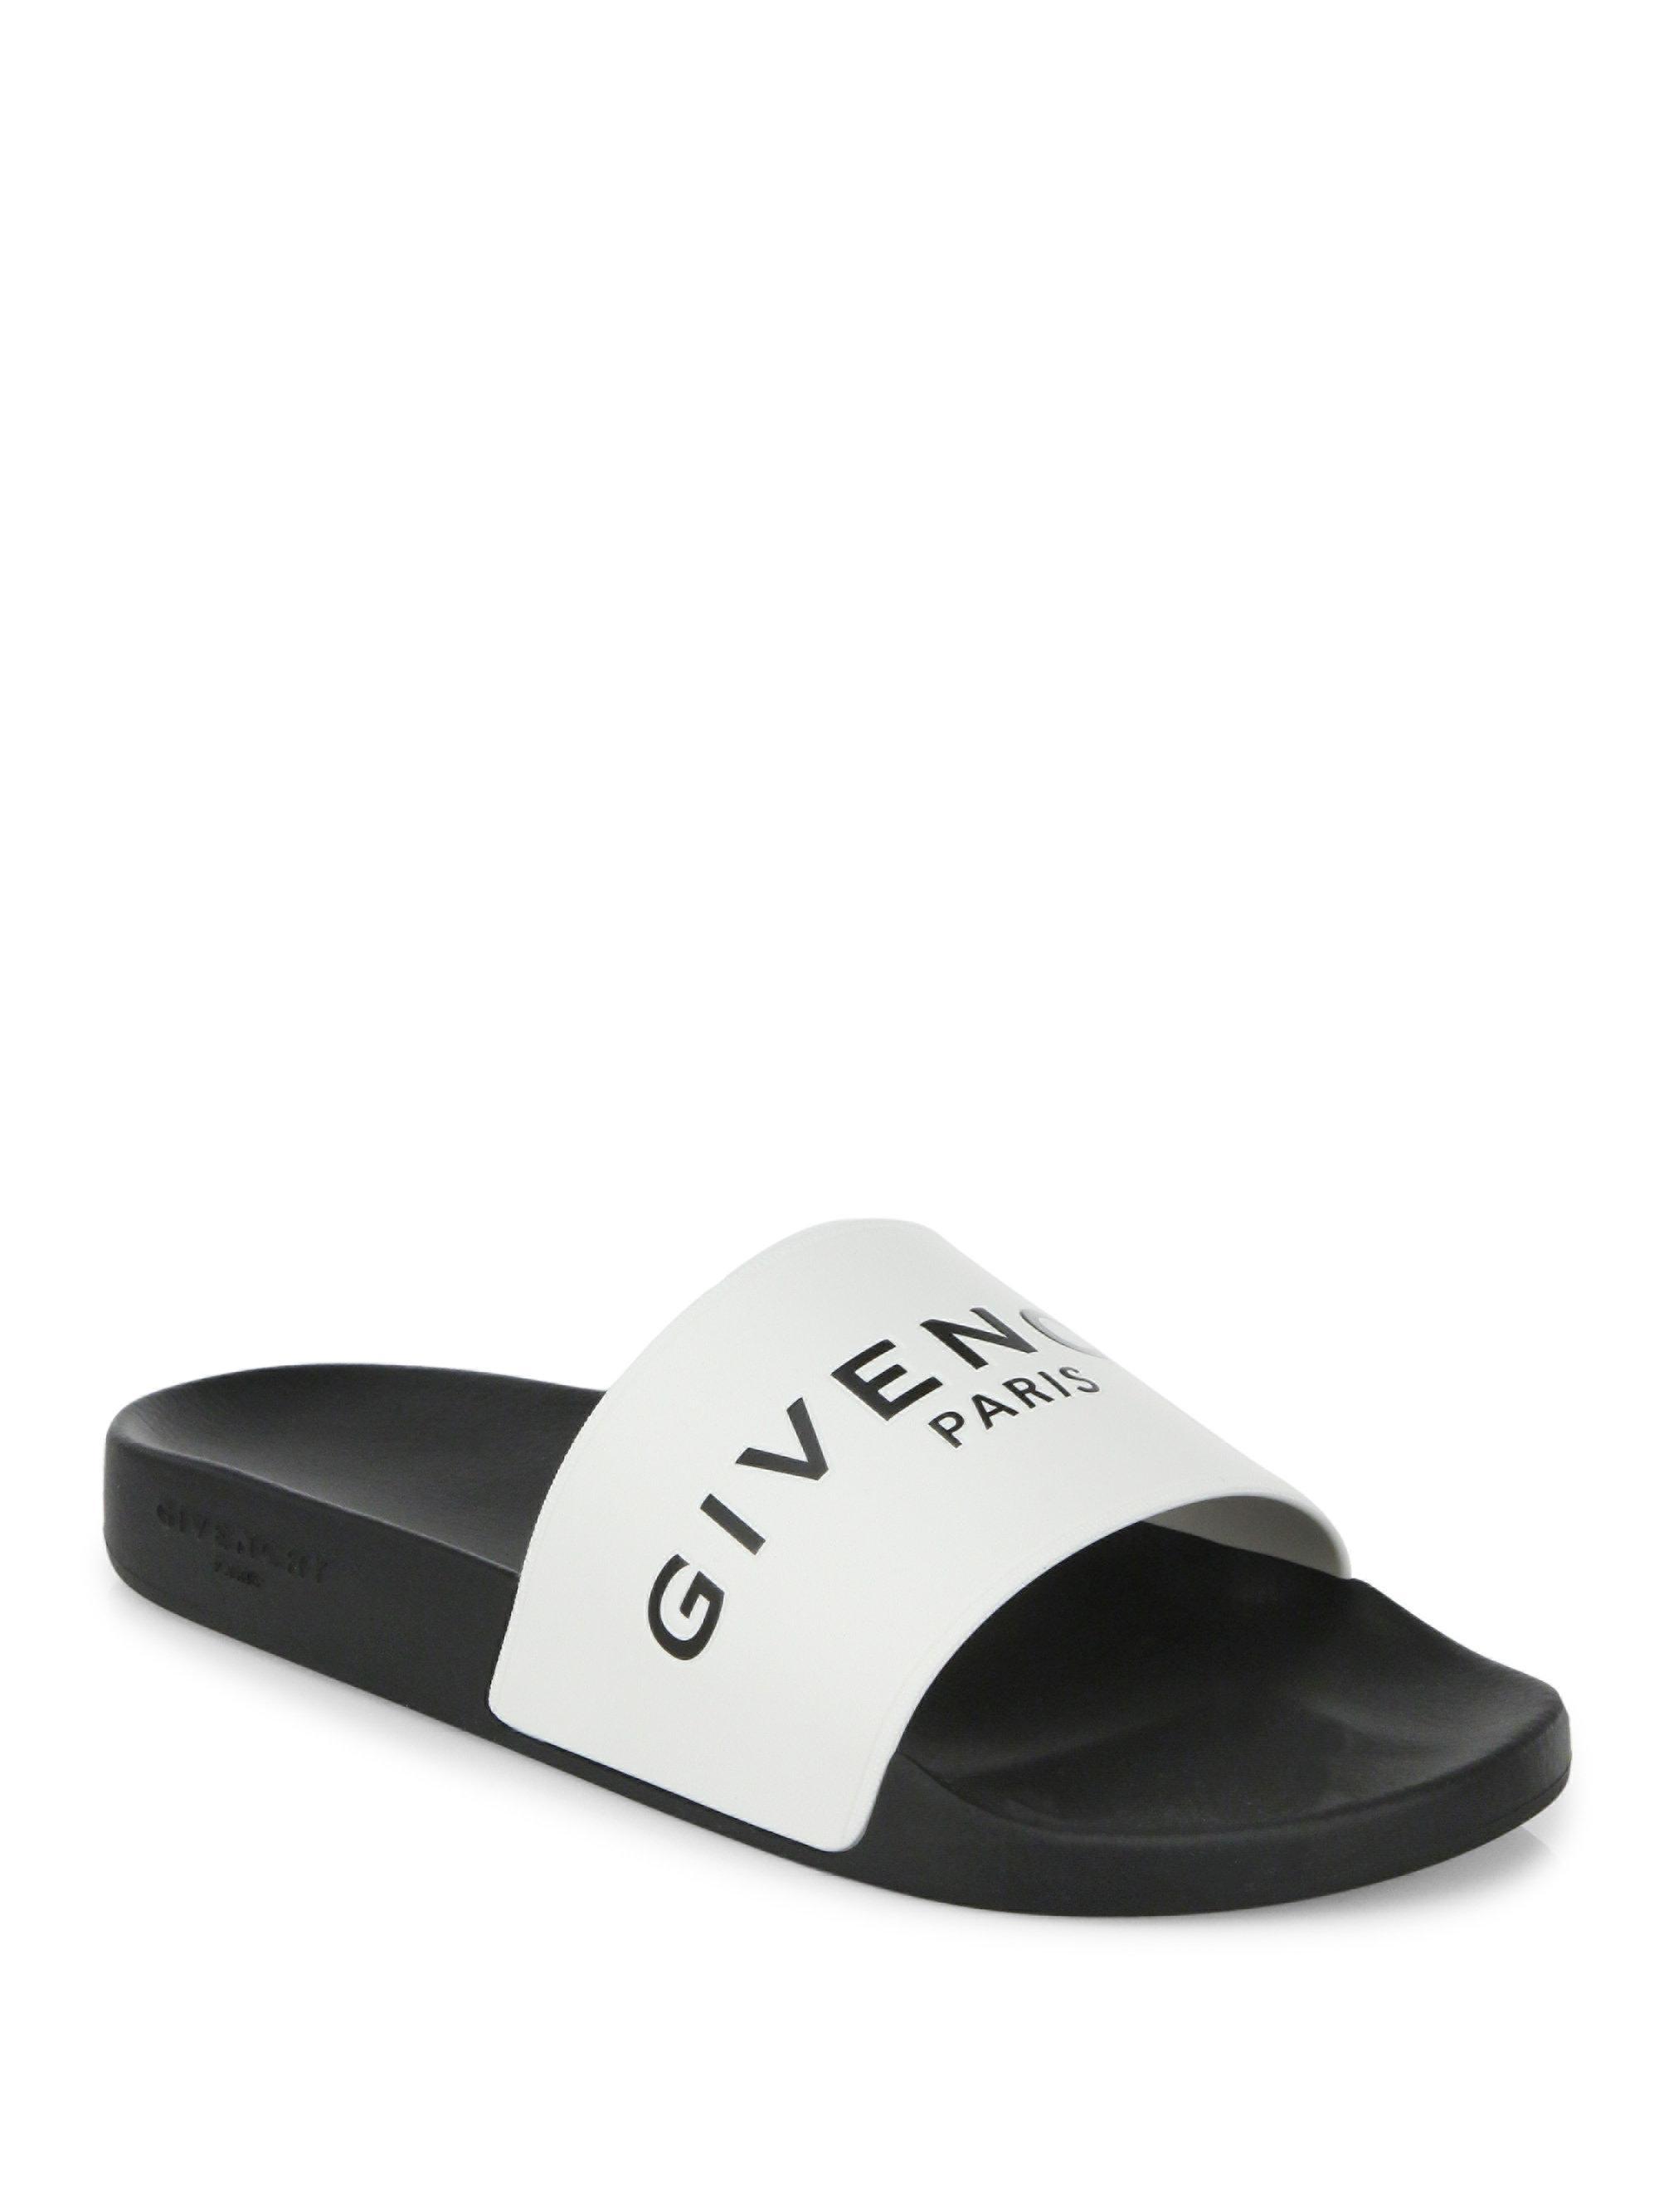 911681ca1e0185 Givenchy Logo Rubber Slides in Black for Men - Save 89% - Lyst